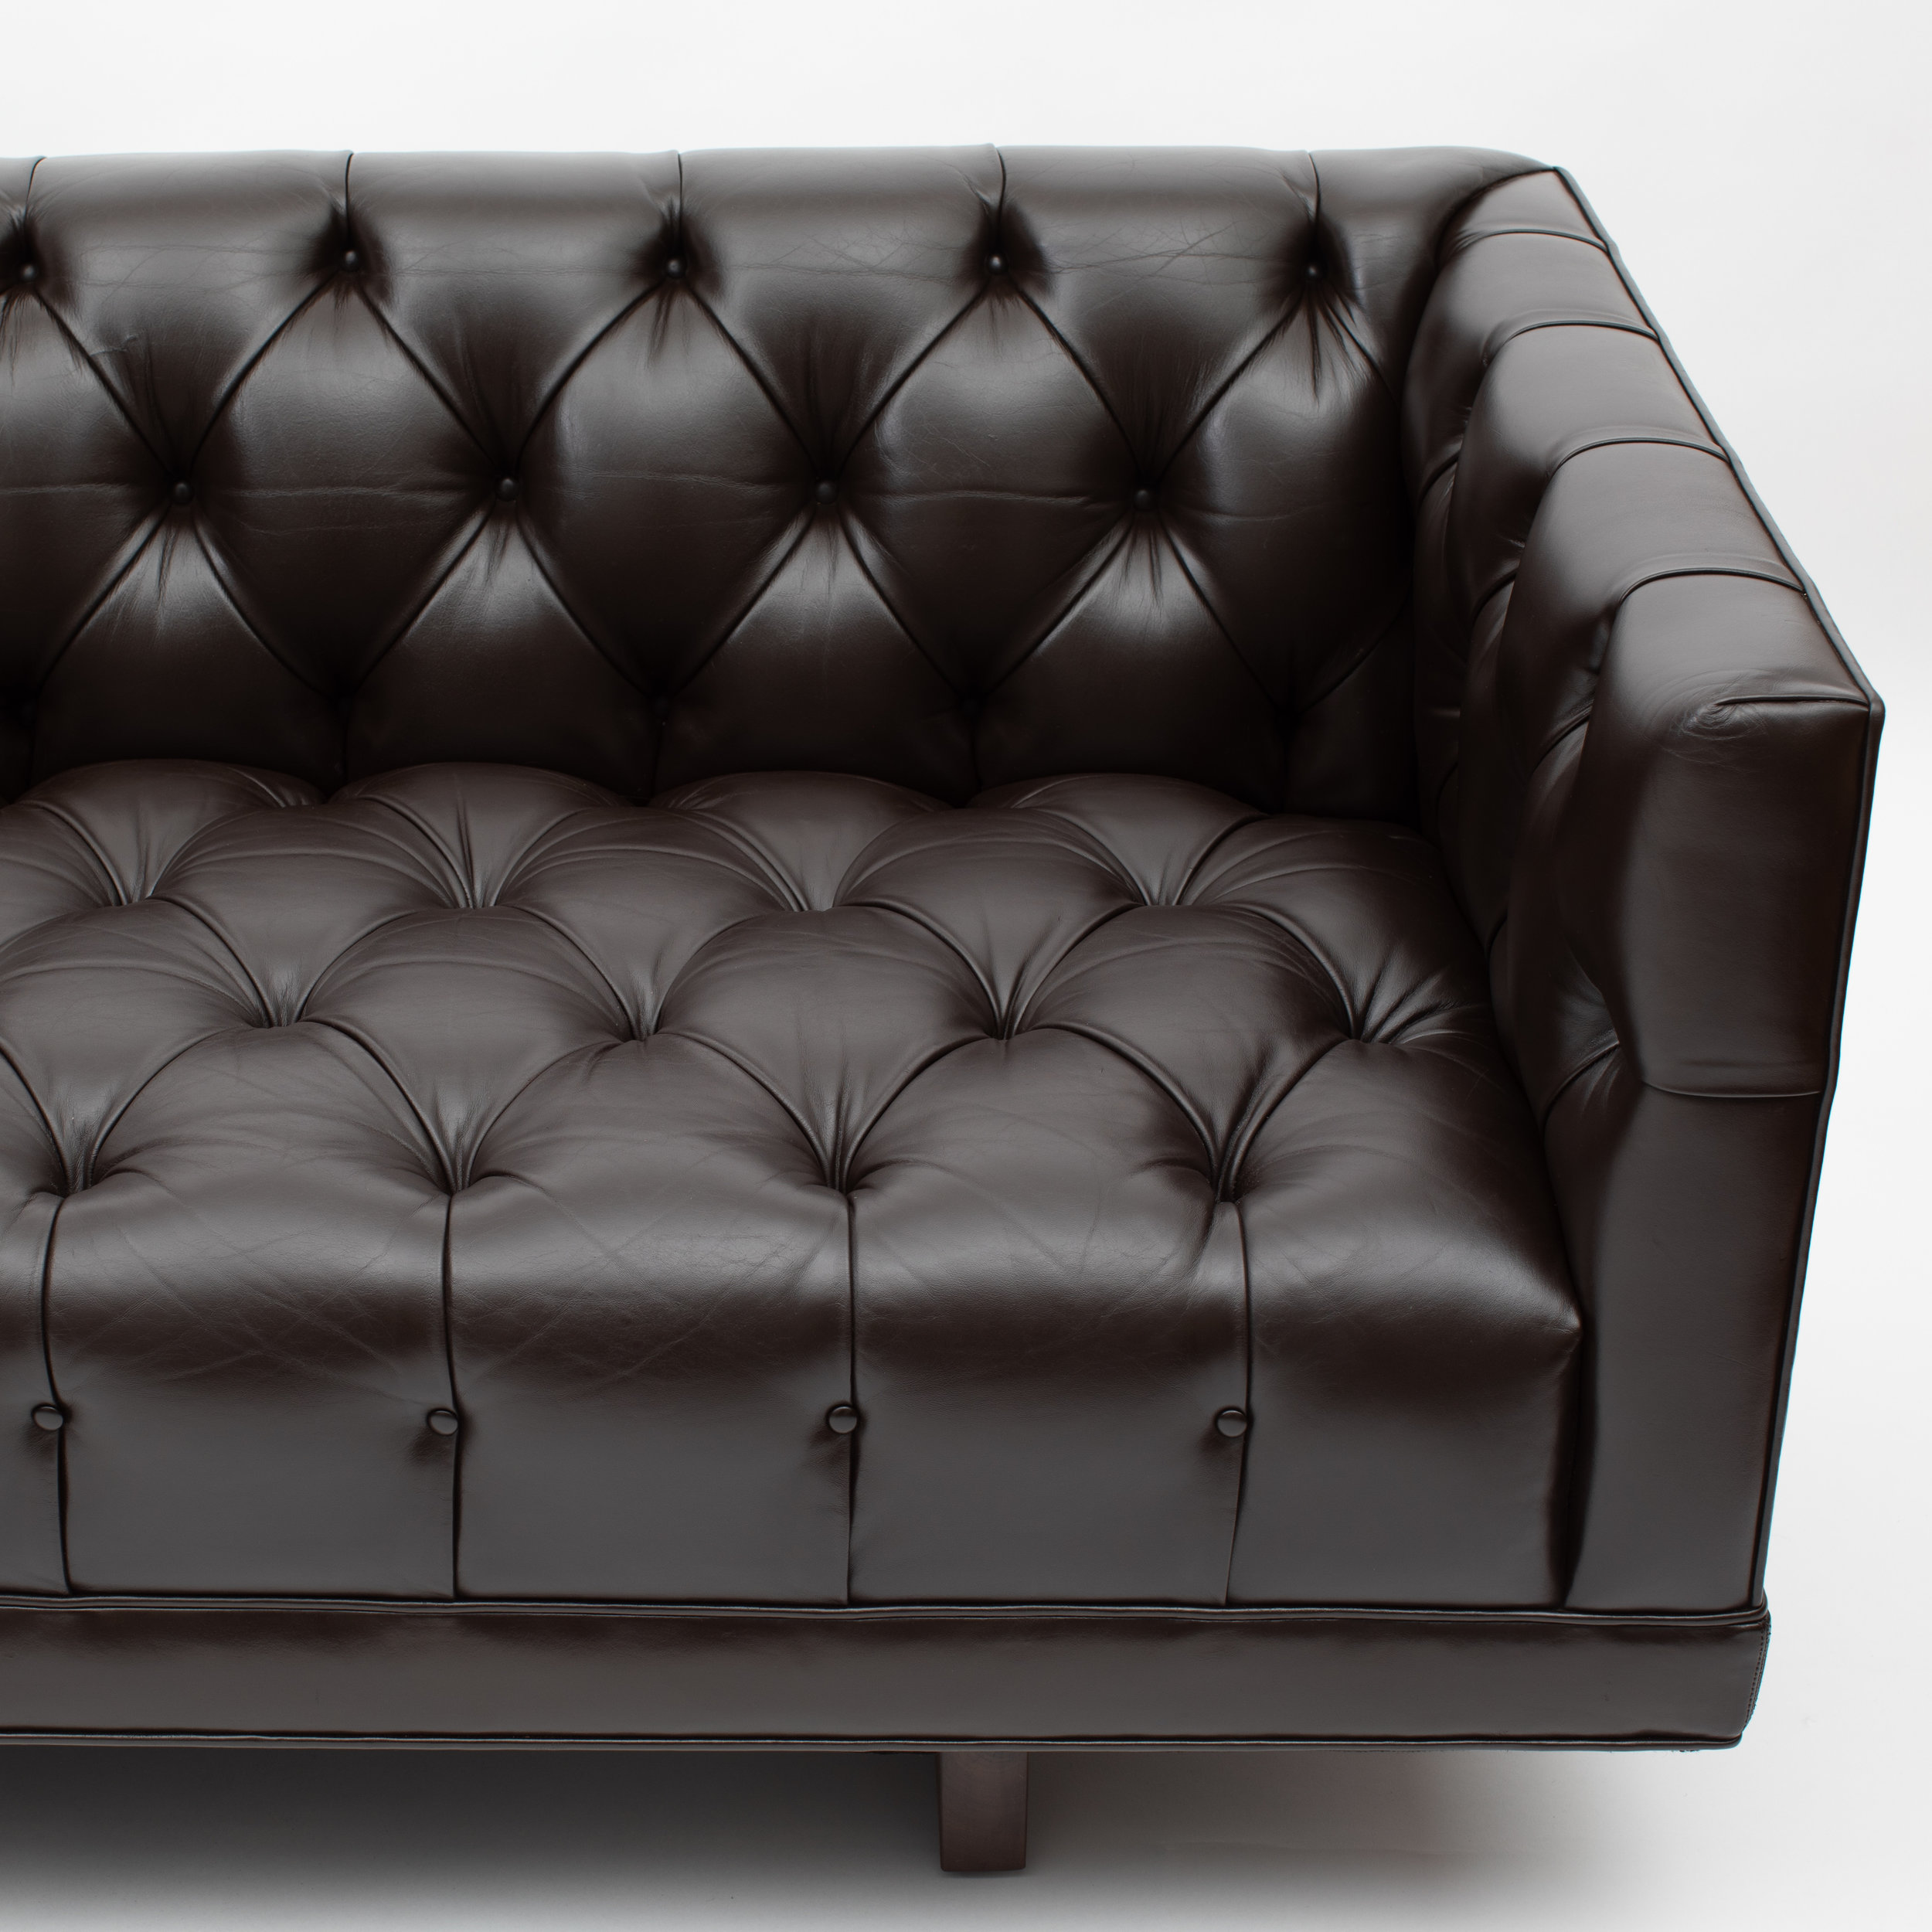 Ward Bennett button-tufted leather sofa for Lehigh Furniture, circa 1960s —  Full Circle Modern